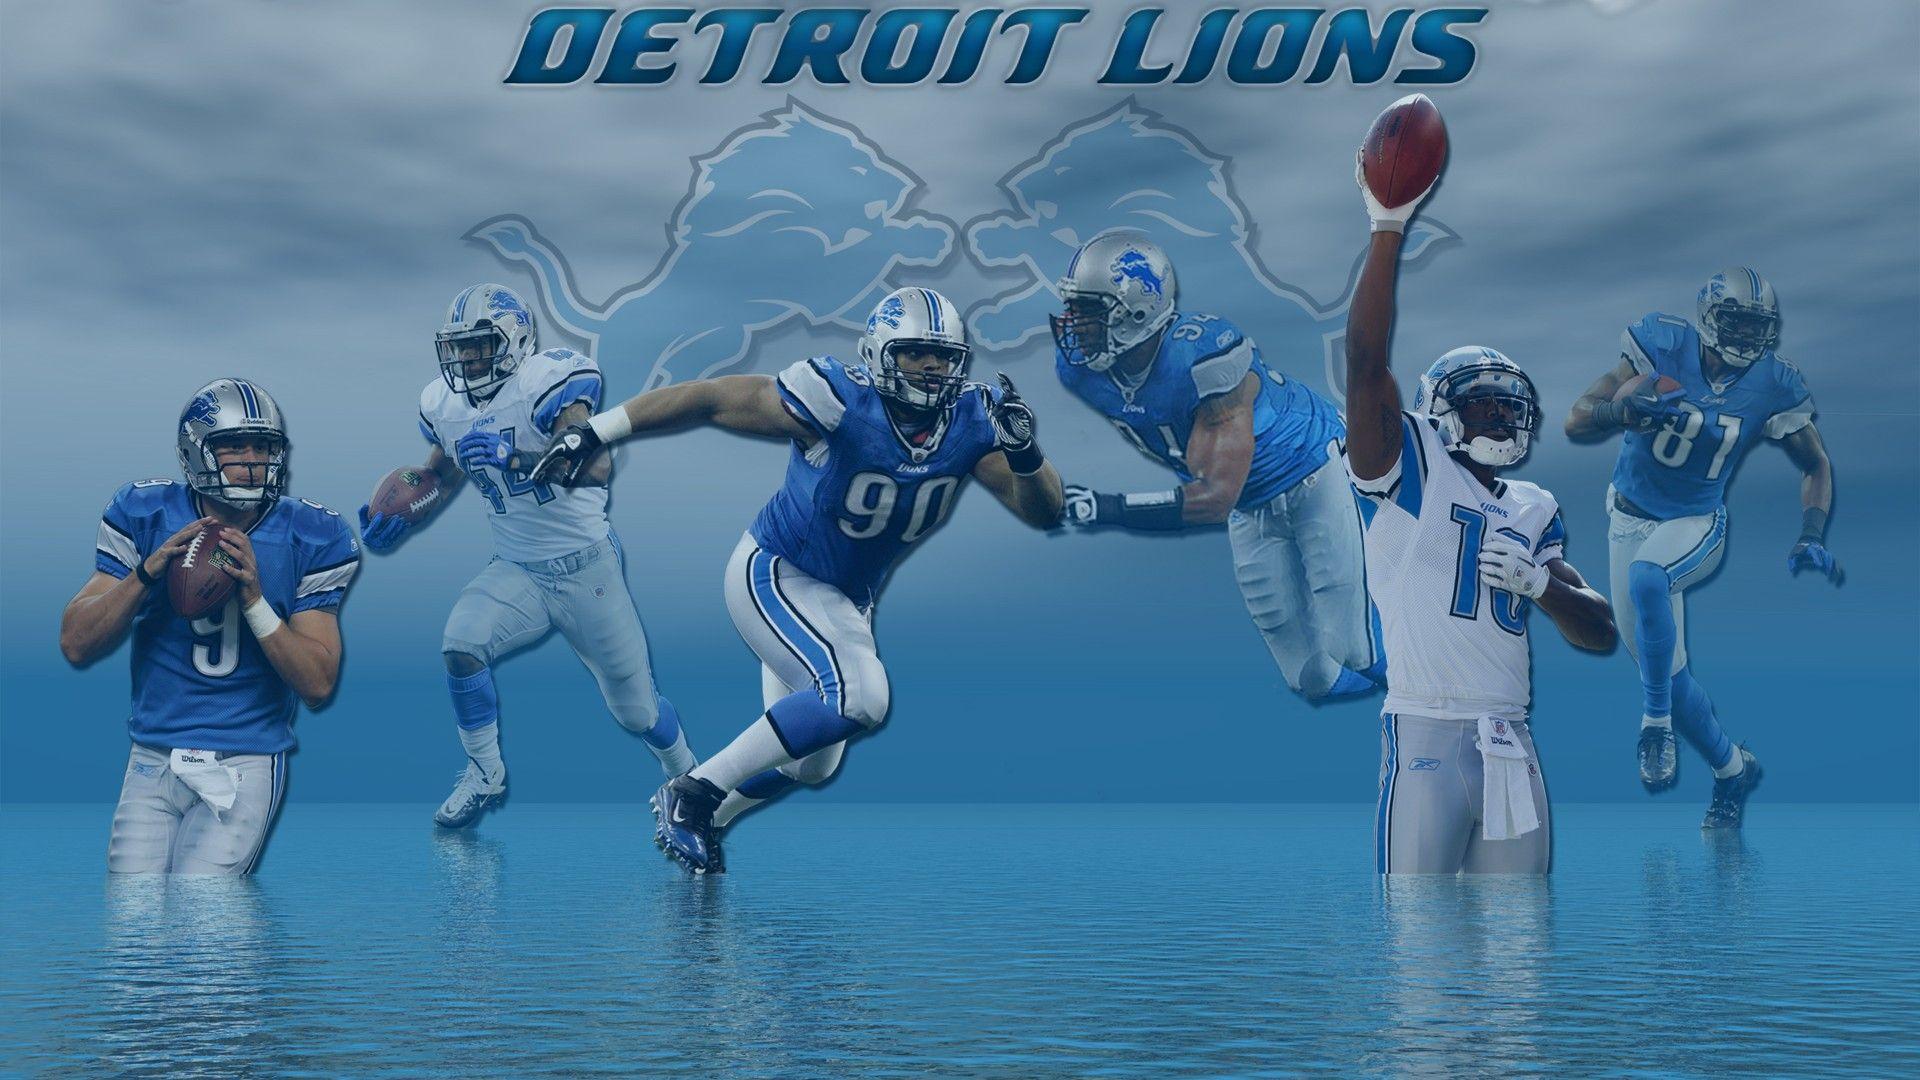 Detroit Lions For Pc Wallpaper 2021 Nfl Football Wallpapers Detroit Lions Wallpaper Detroit Lions Detroit Lions Football